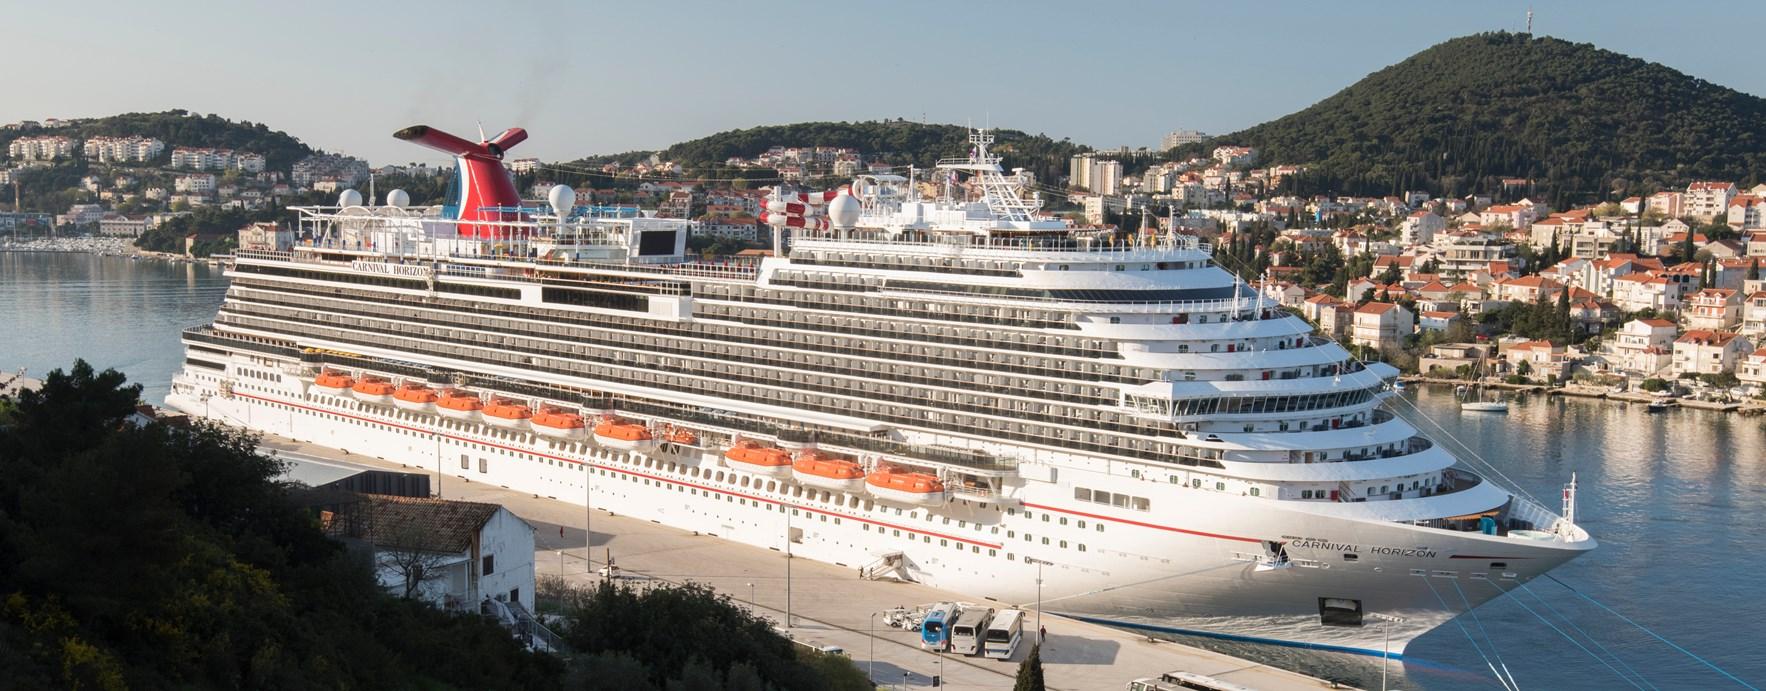 ship_HZ_Dubrovnik_20180408_RAD0066